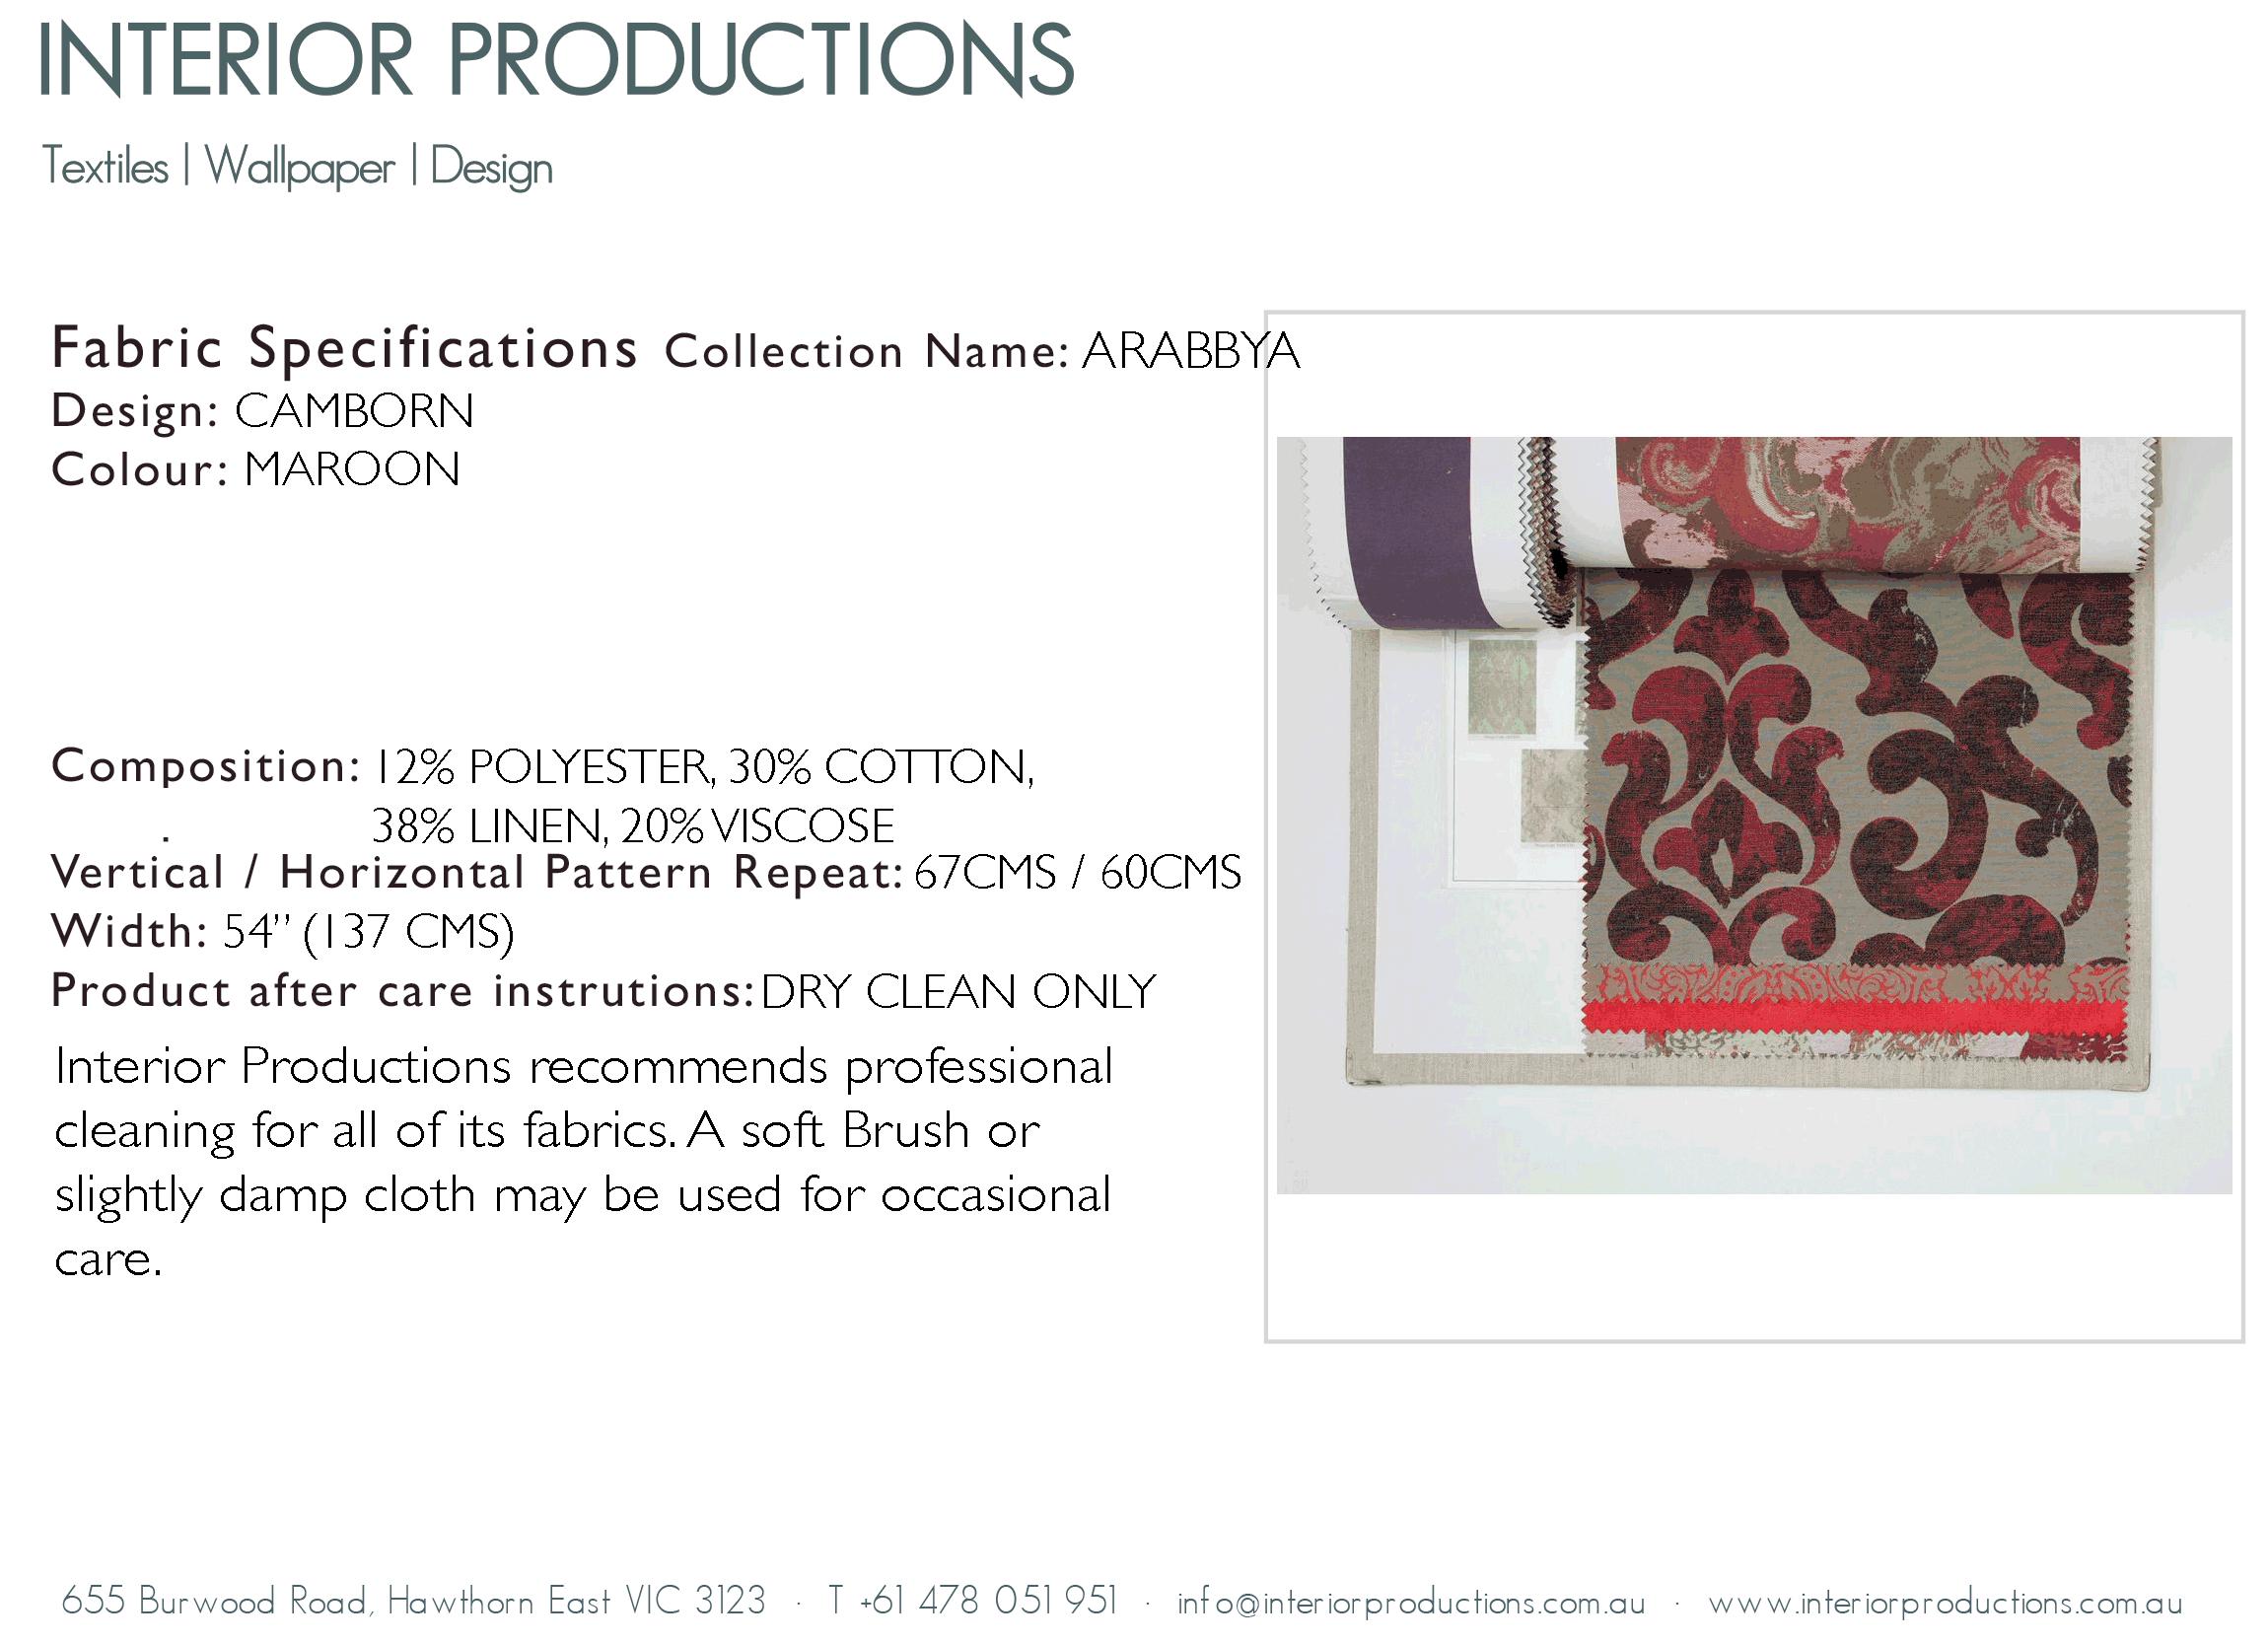 interior_productions_CAMBORN---MAROON